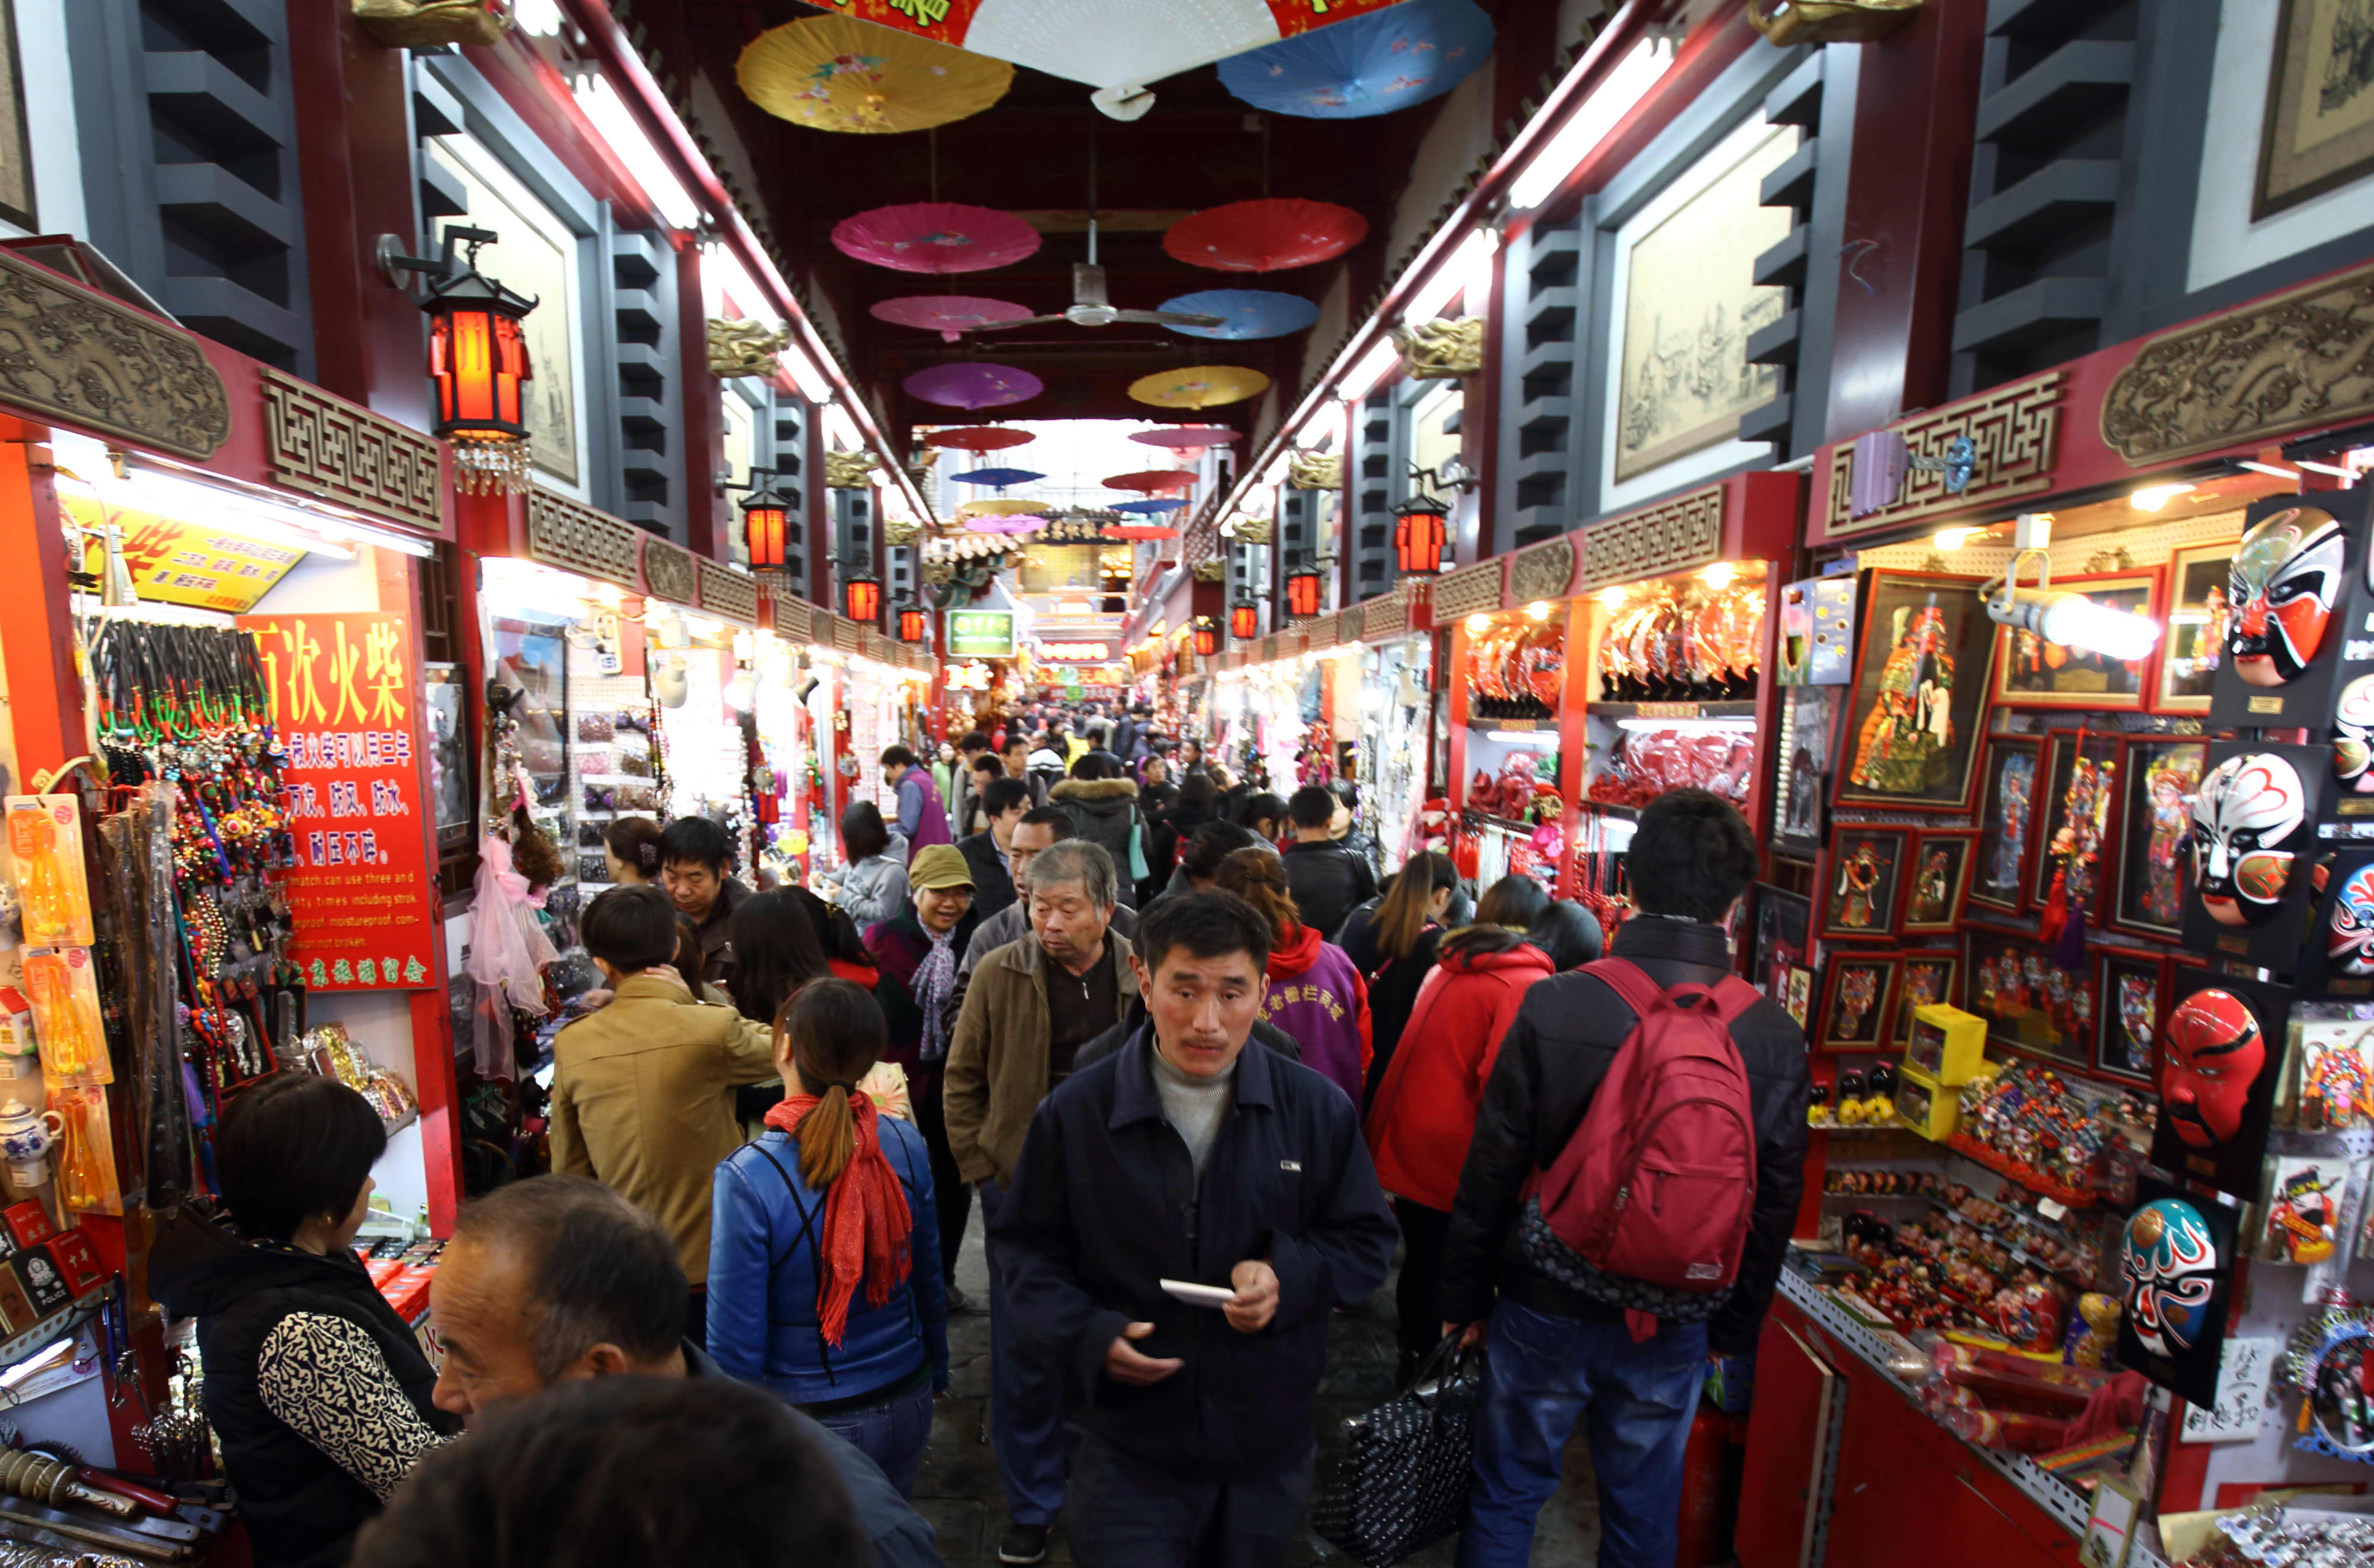 China's $670 billion 'sheconomy' is growing like crazy